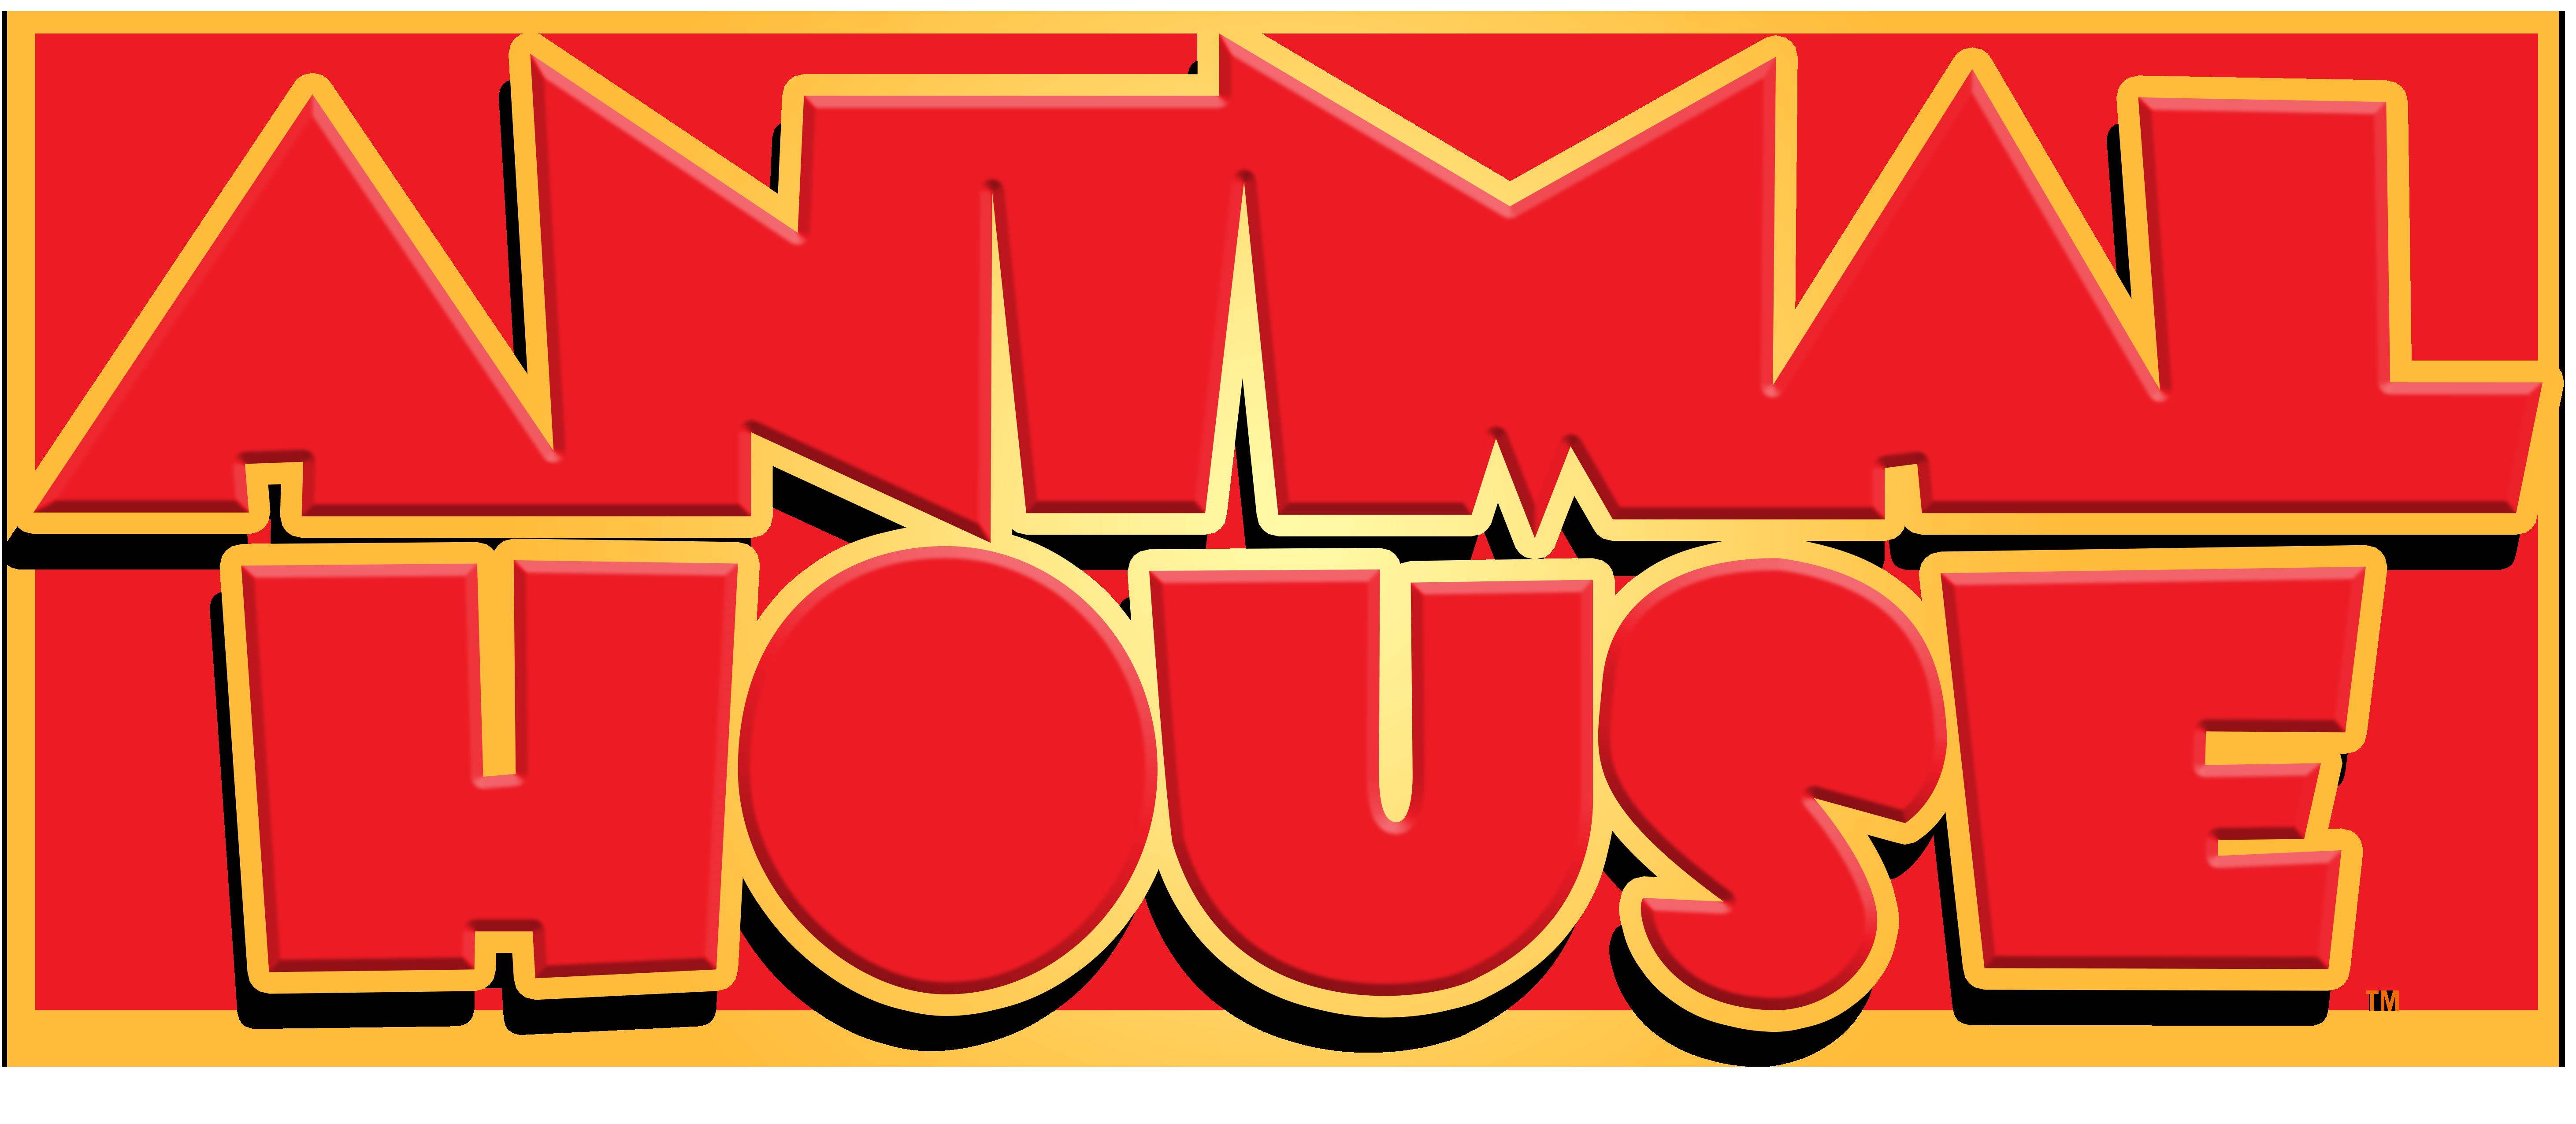 Monopoly house png. Sg gaming animal logo